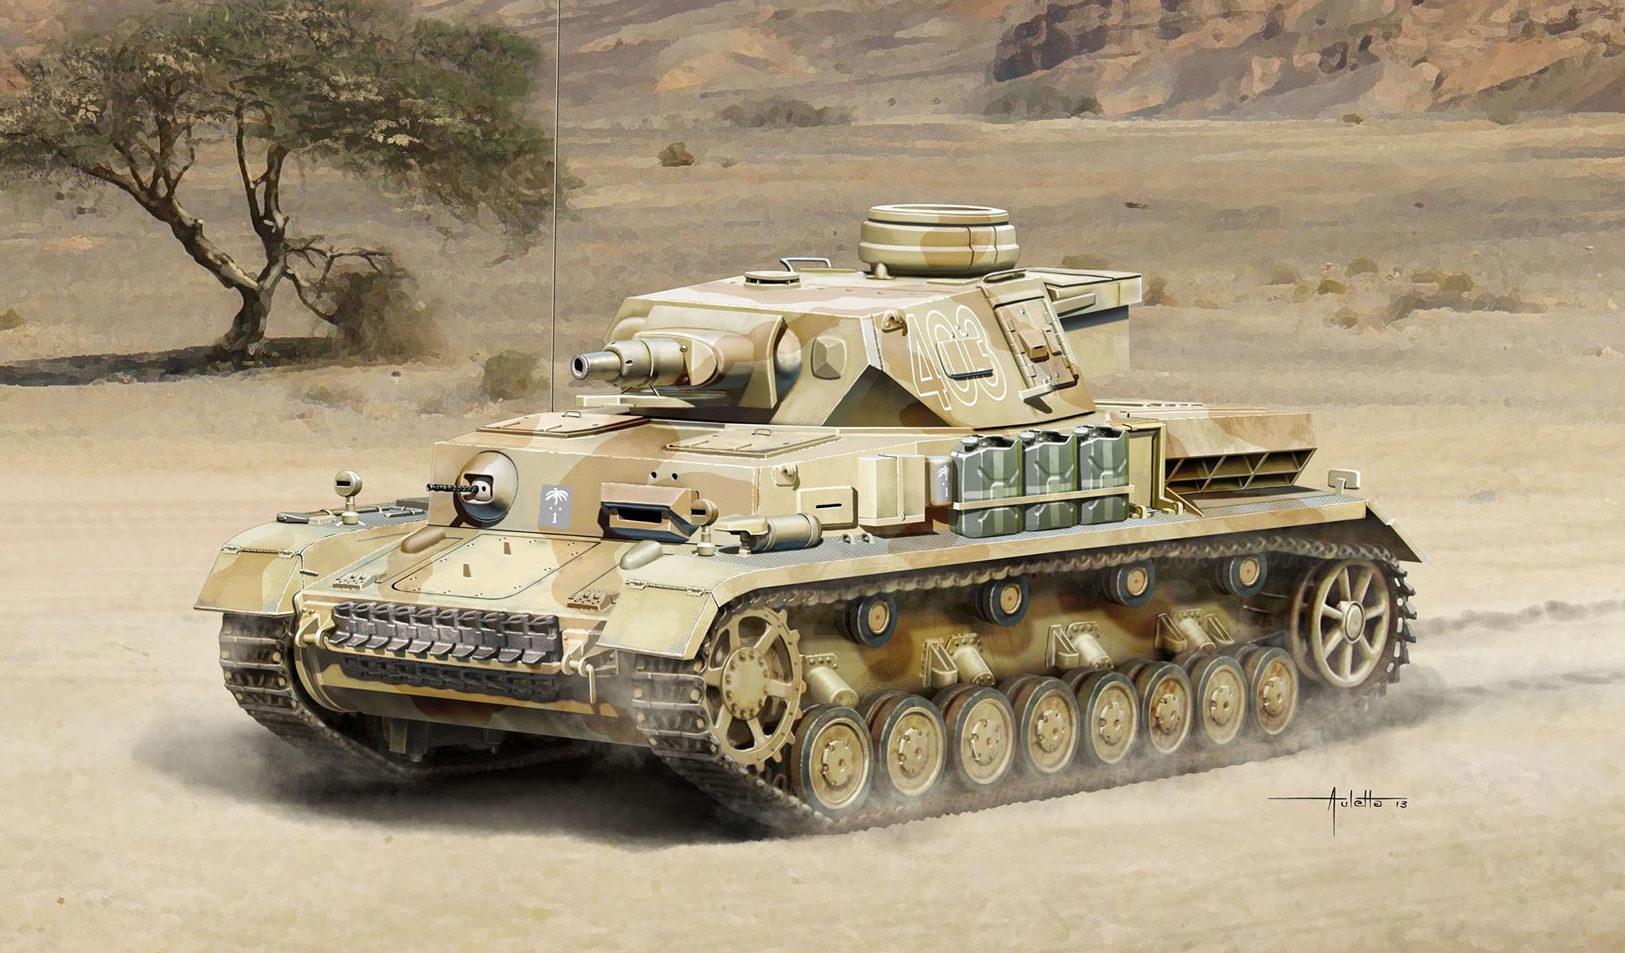 Auletta Vincenzo. Танк Pz.Kpfw.IV Ausf.F1.